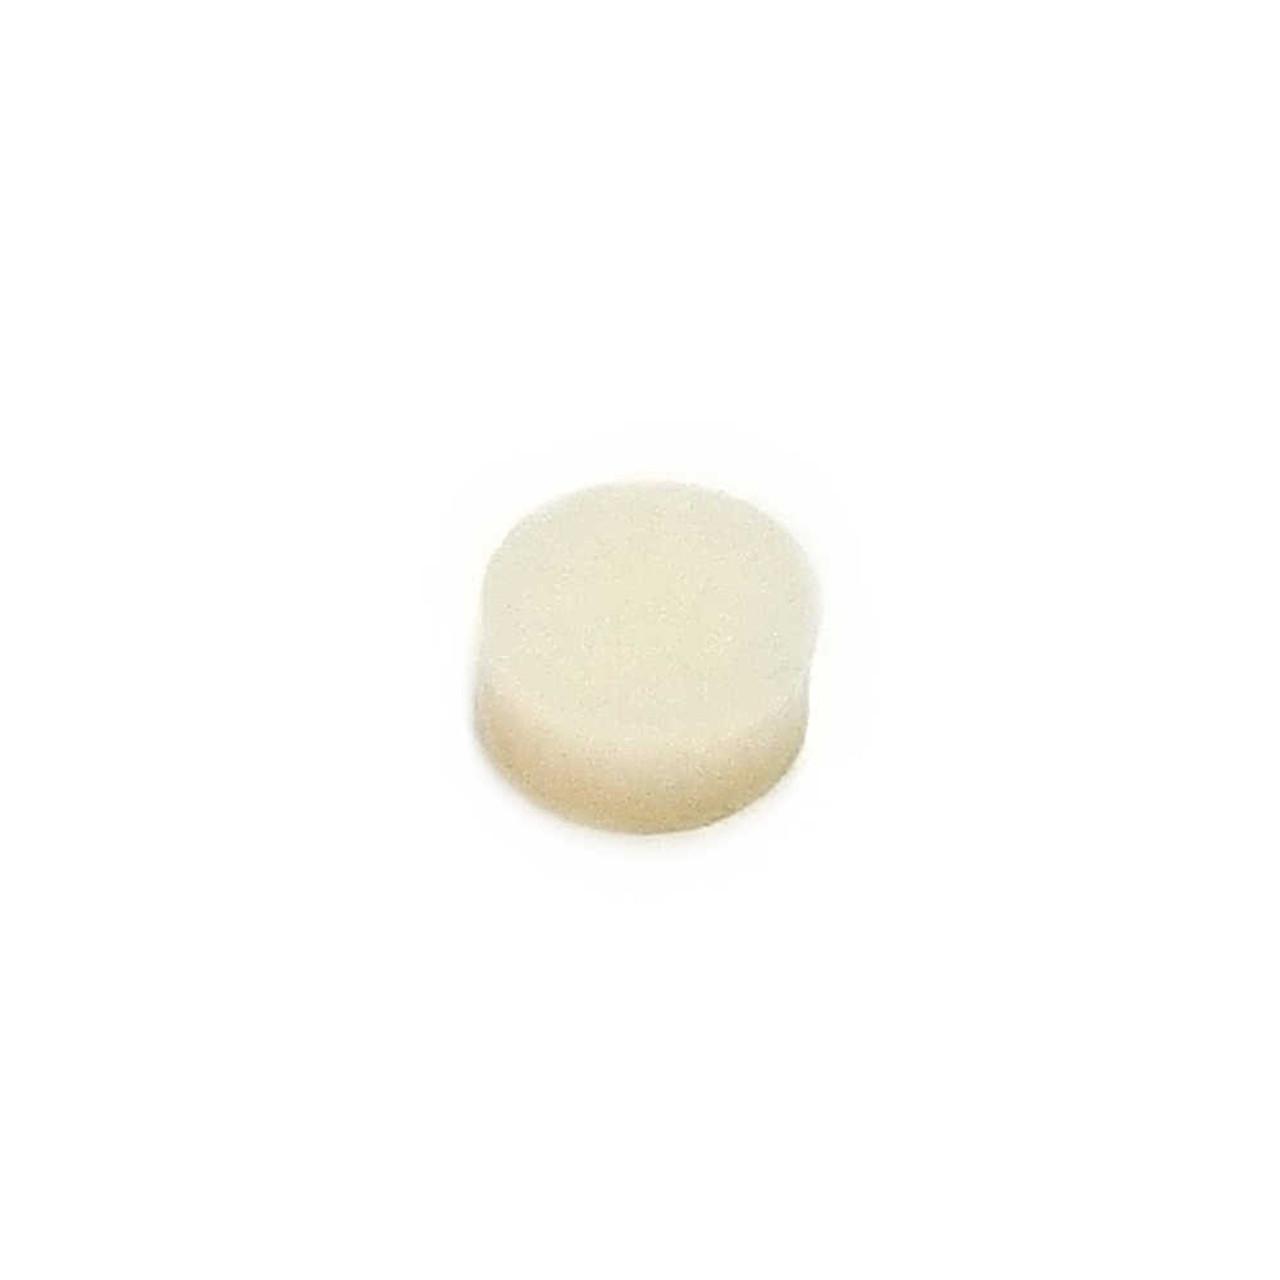 "Inlay Dots - 1/4"" White (pkg 50)"